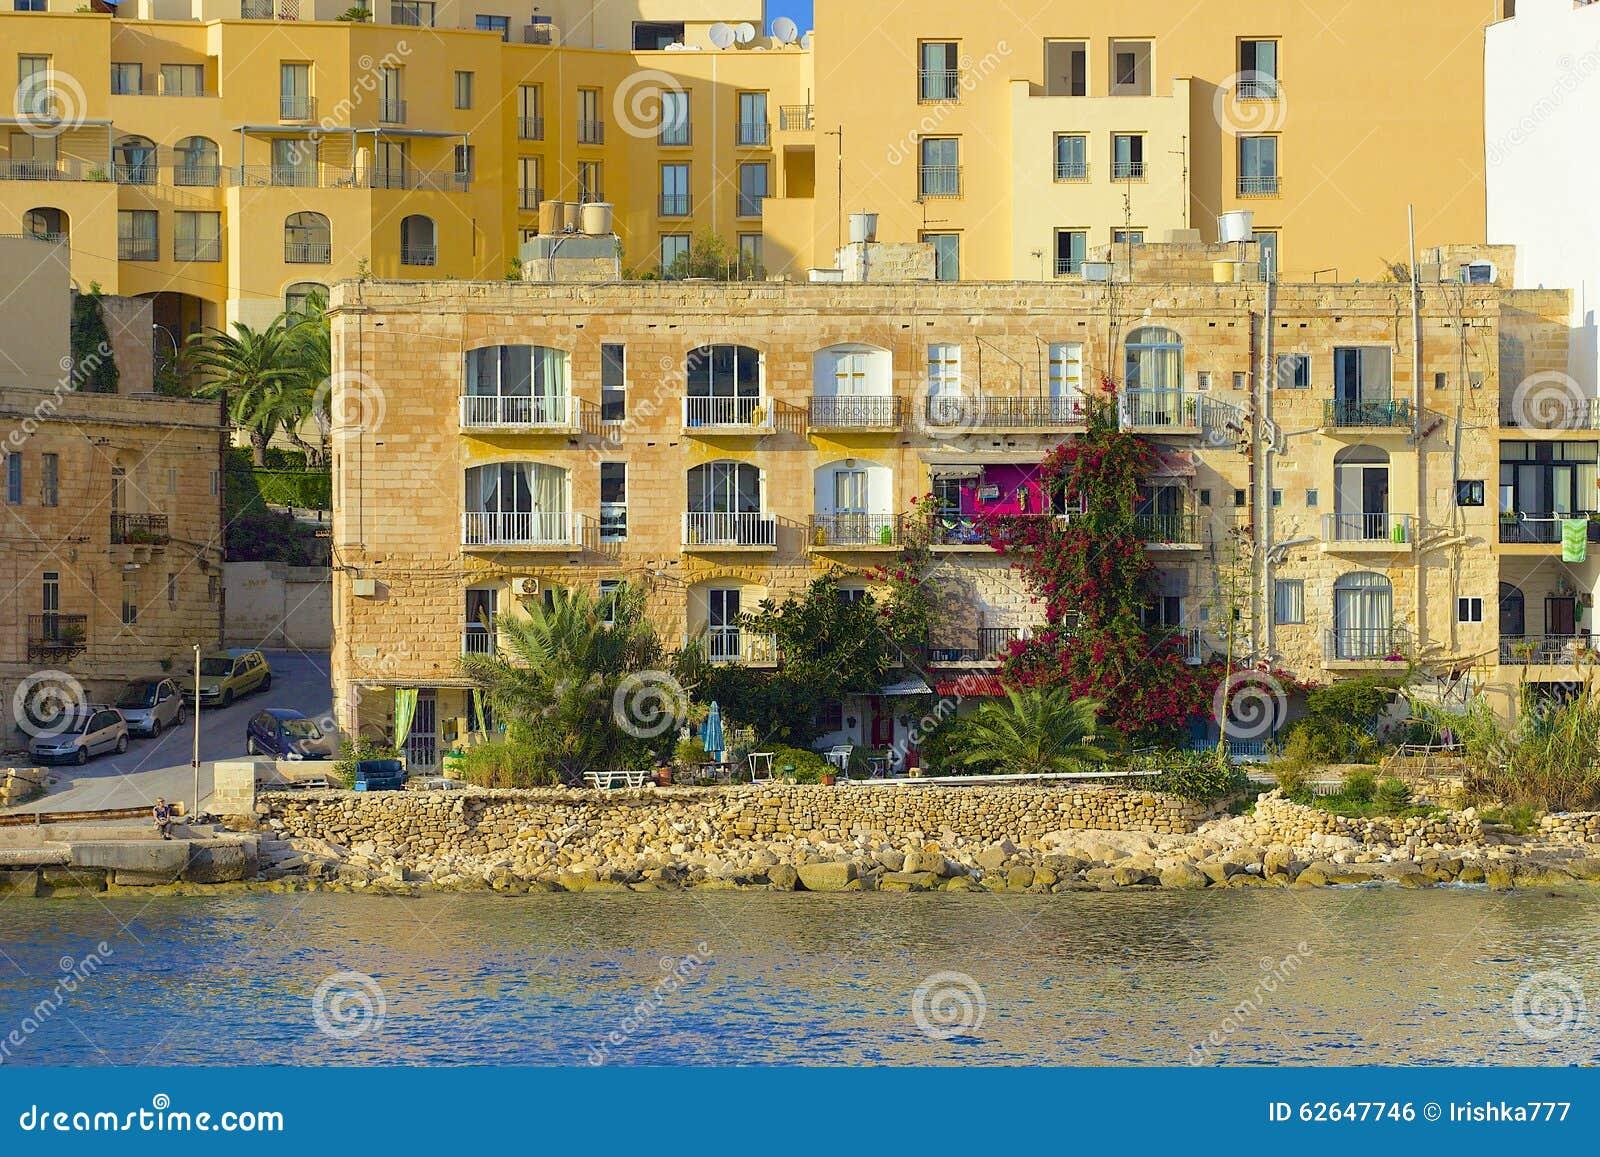 Panorama of St Julians in Malta